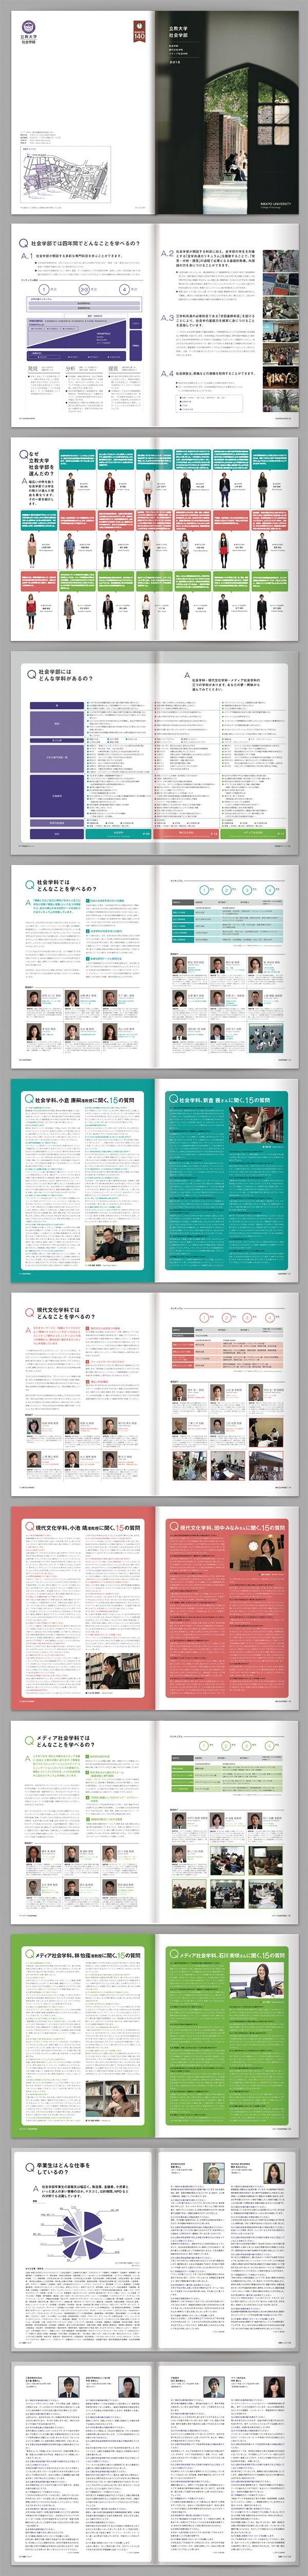 print design / layout | Rikkyo University, Department of Sociology 2015 (立教大学 /社会学部案内) #japan